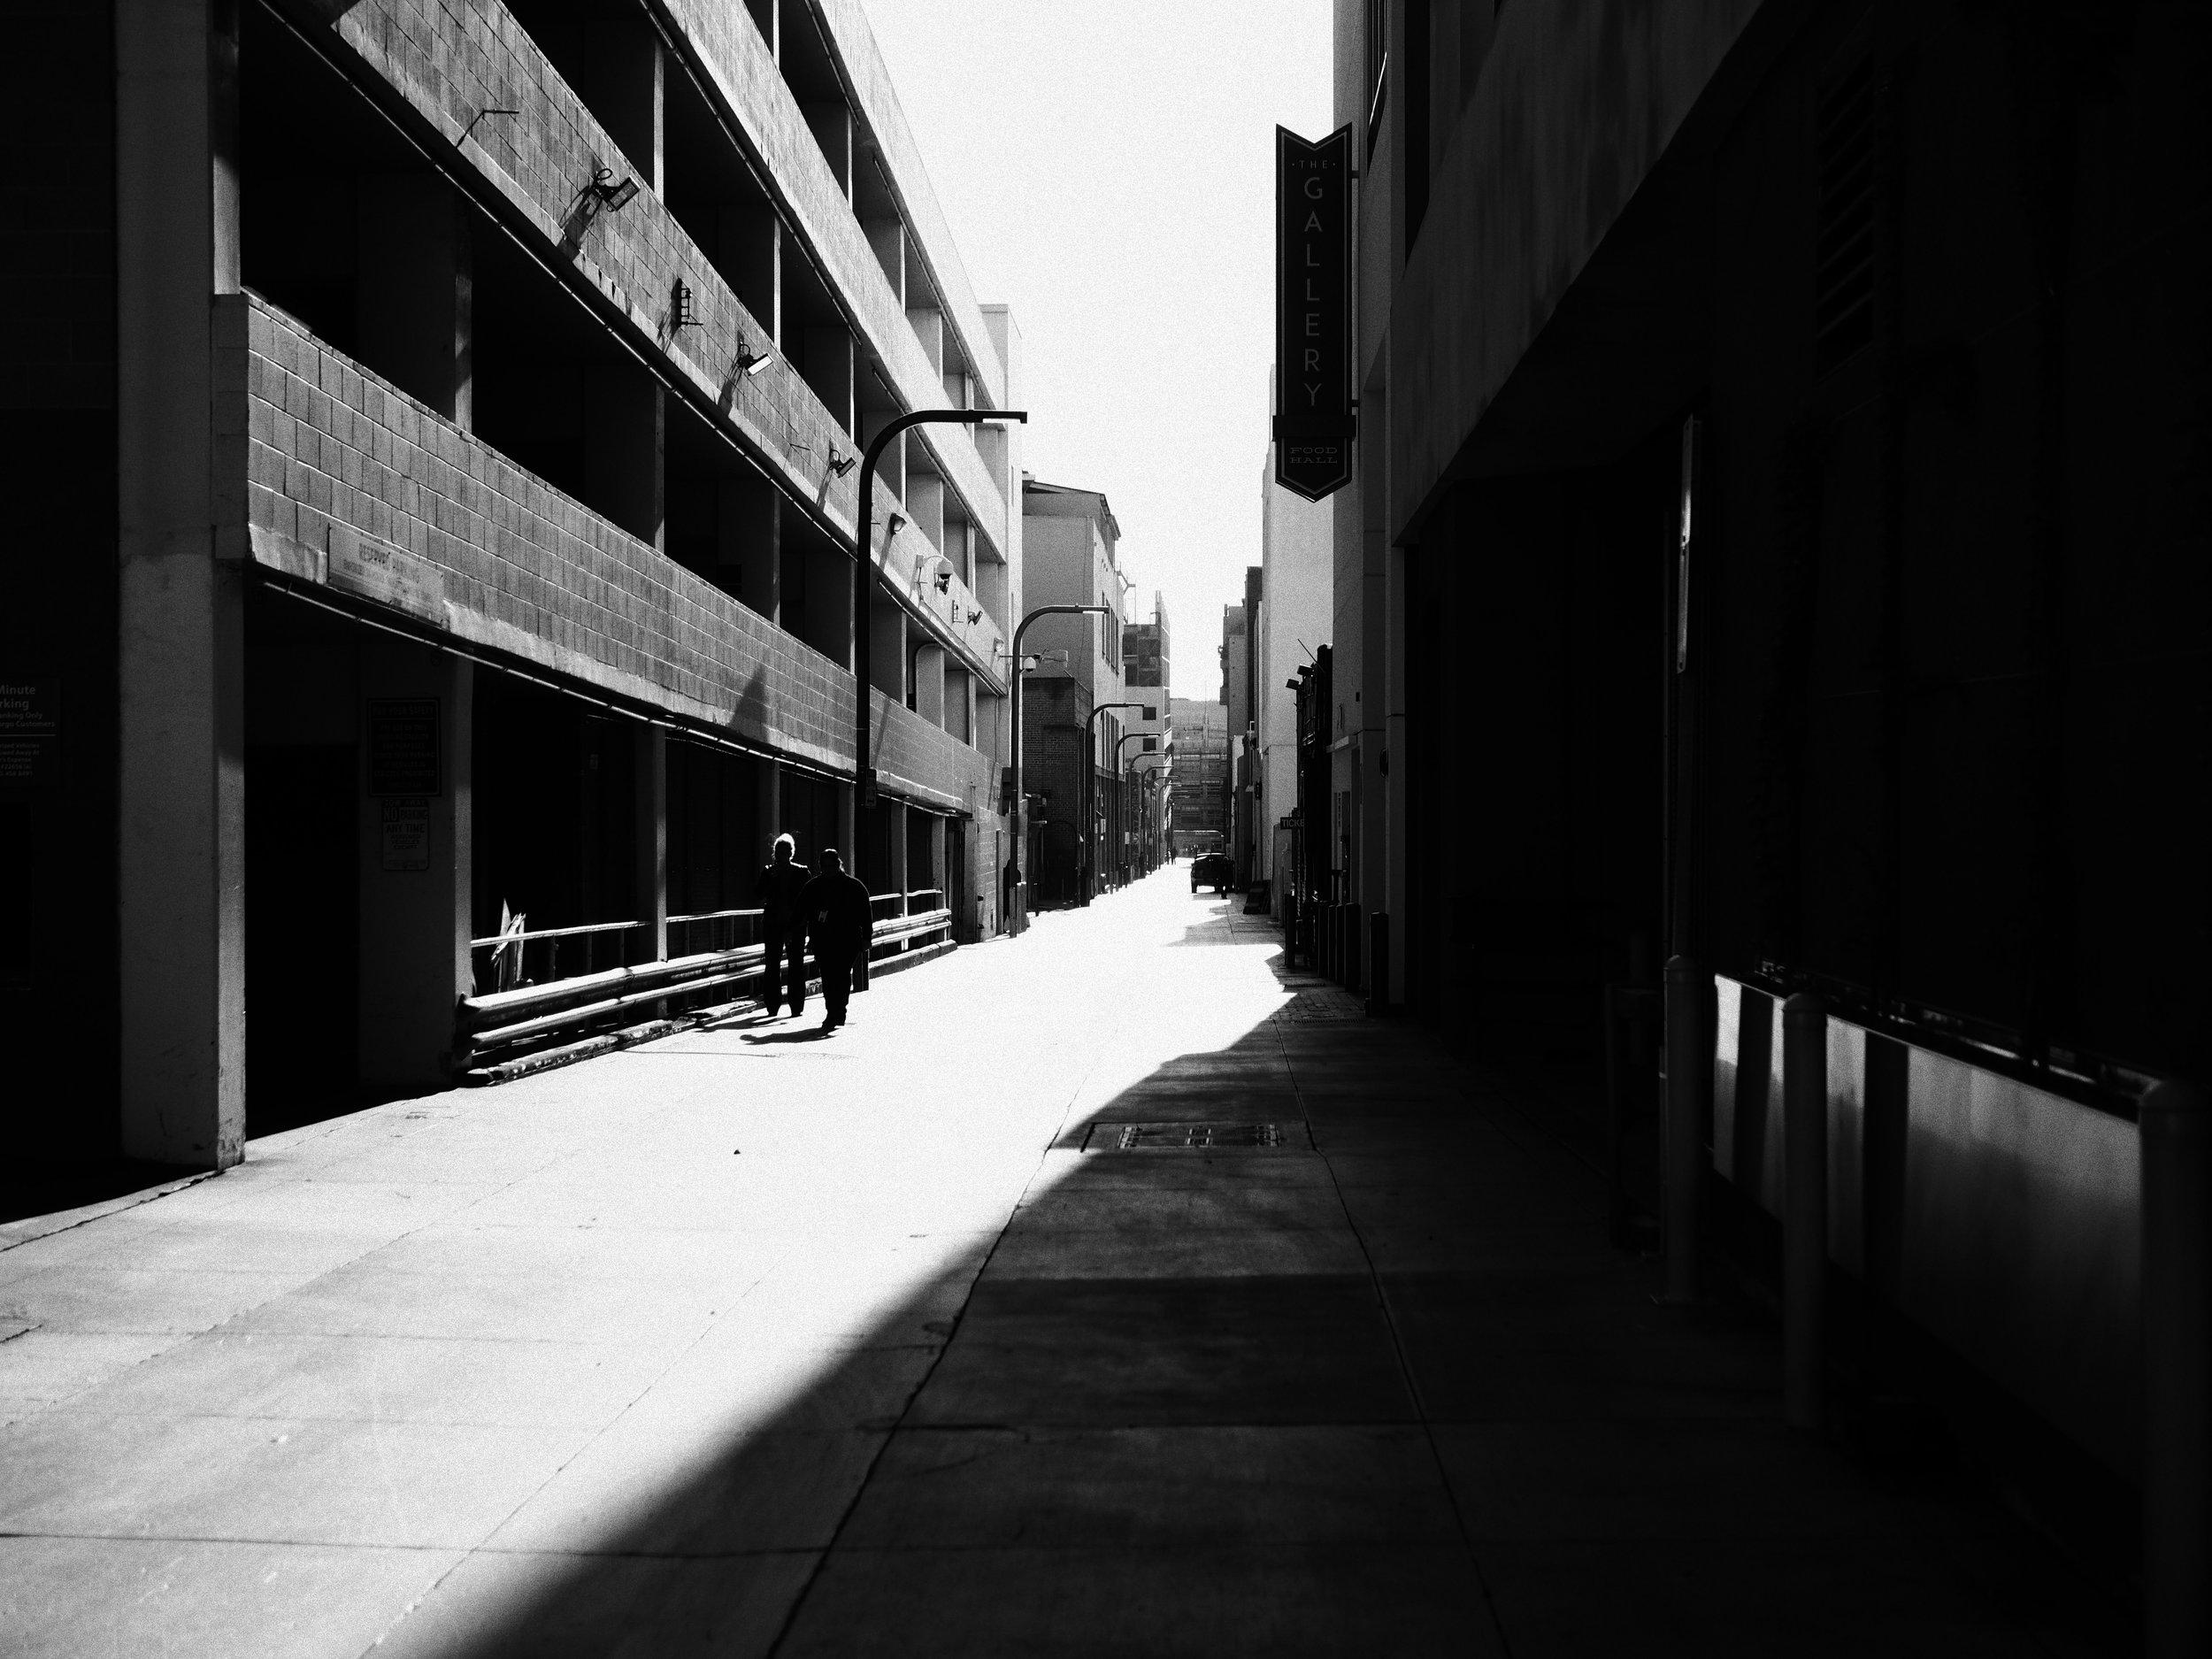 Divided 2 / Light and Dark